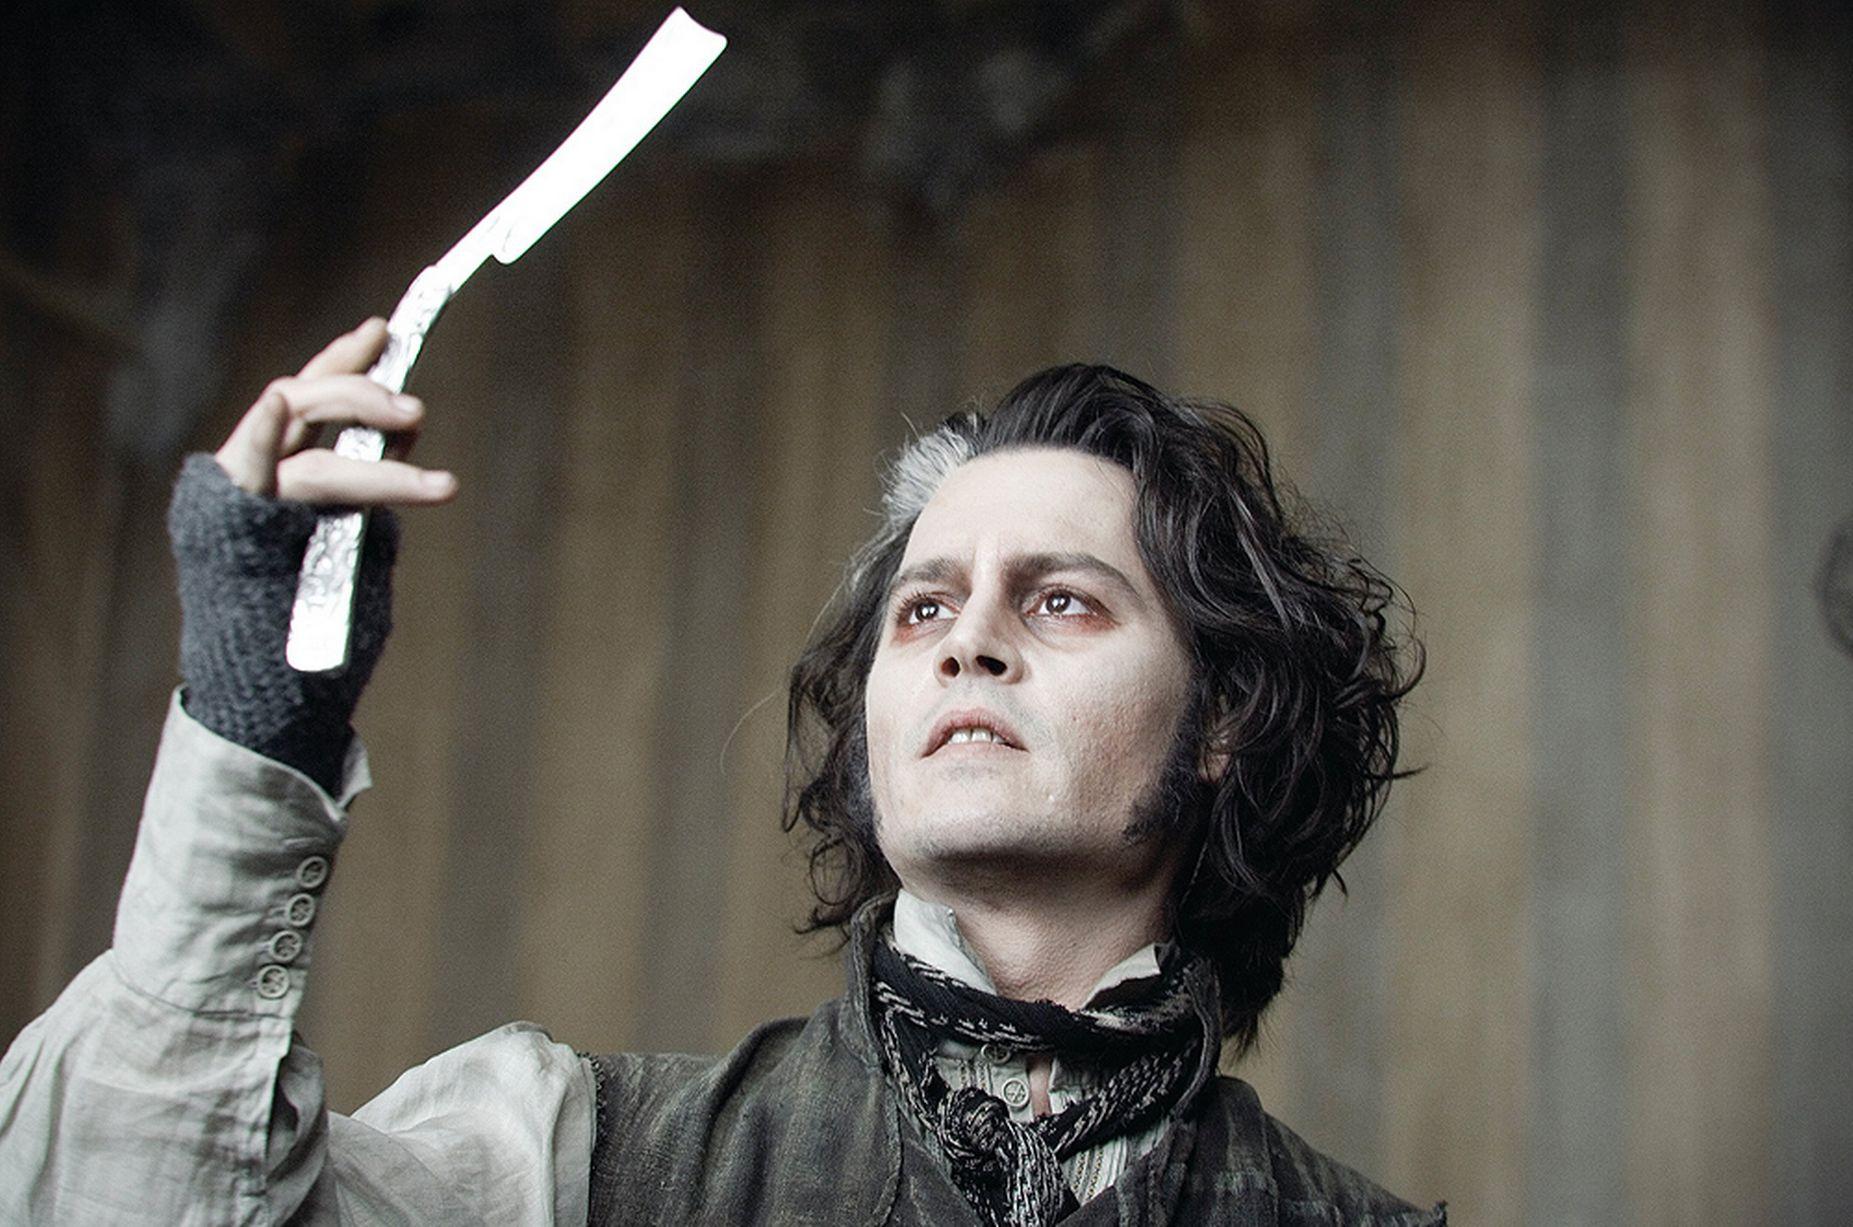 Sweeney-Todd-2007-Johnny-Depp